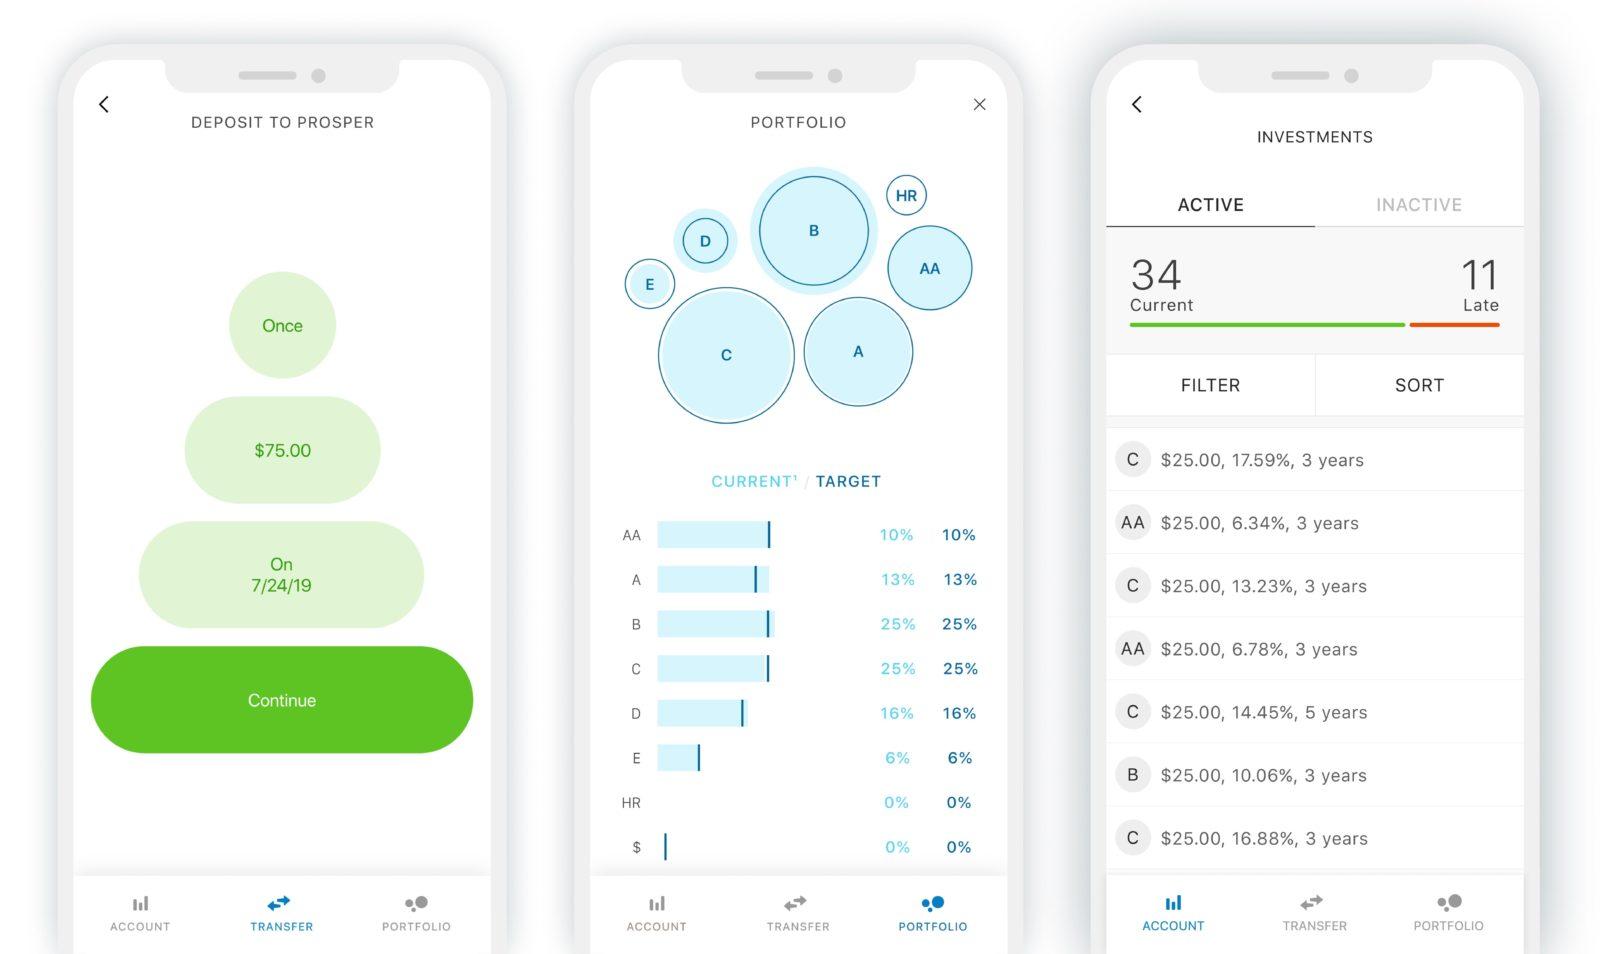 Introducing the Prosper Invest Mobile App